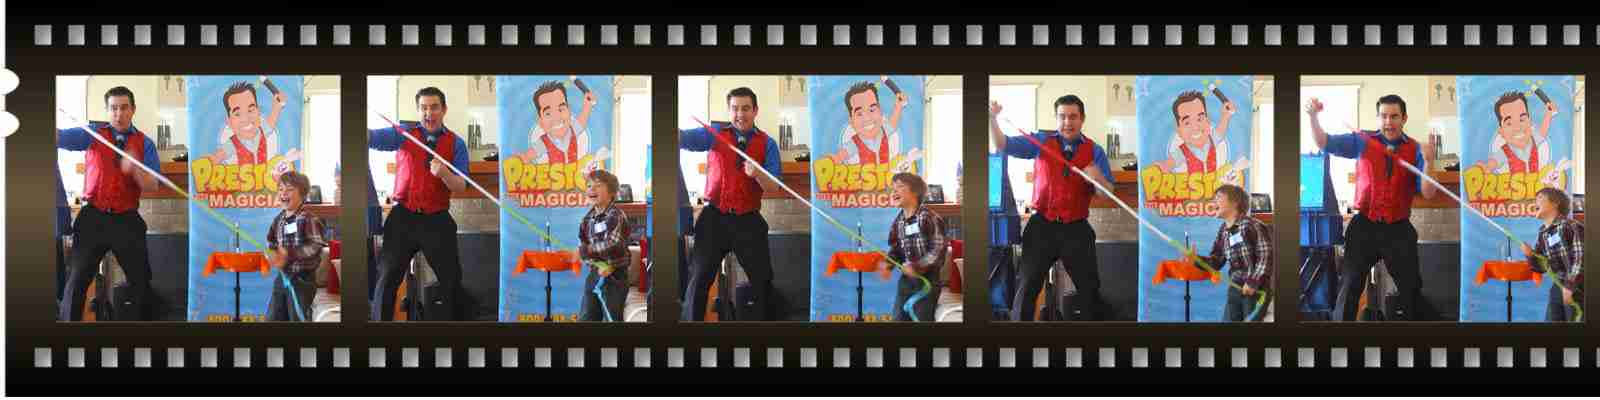 kids magic birthday party entertainer - Presto the Magician